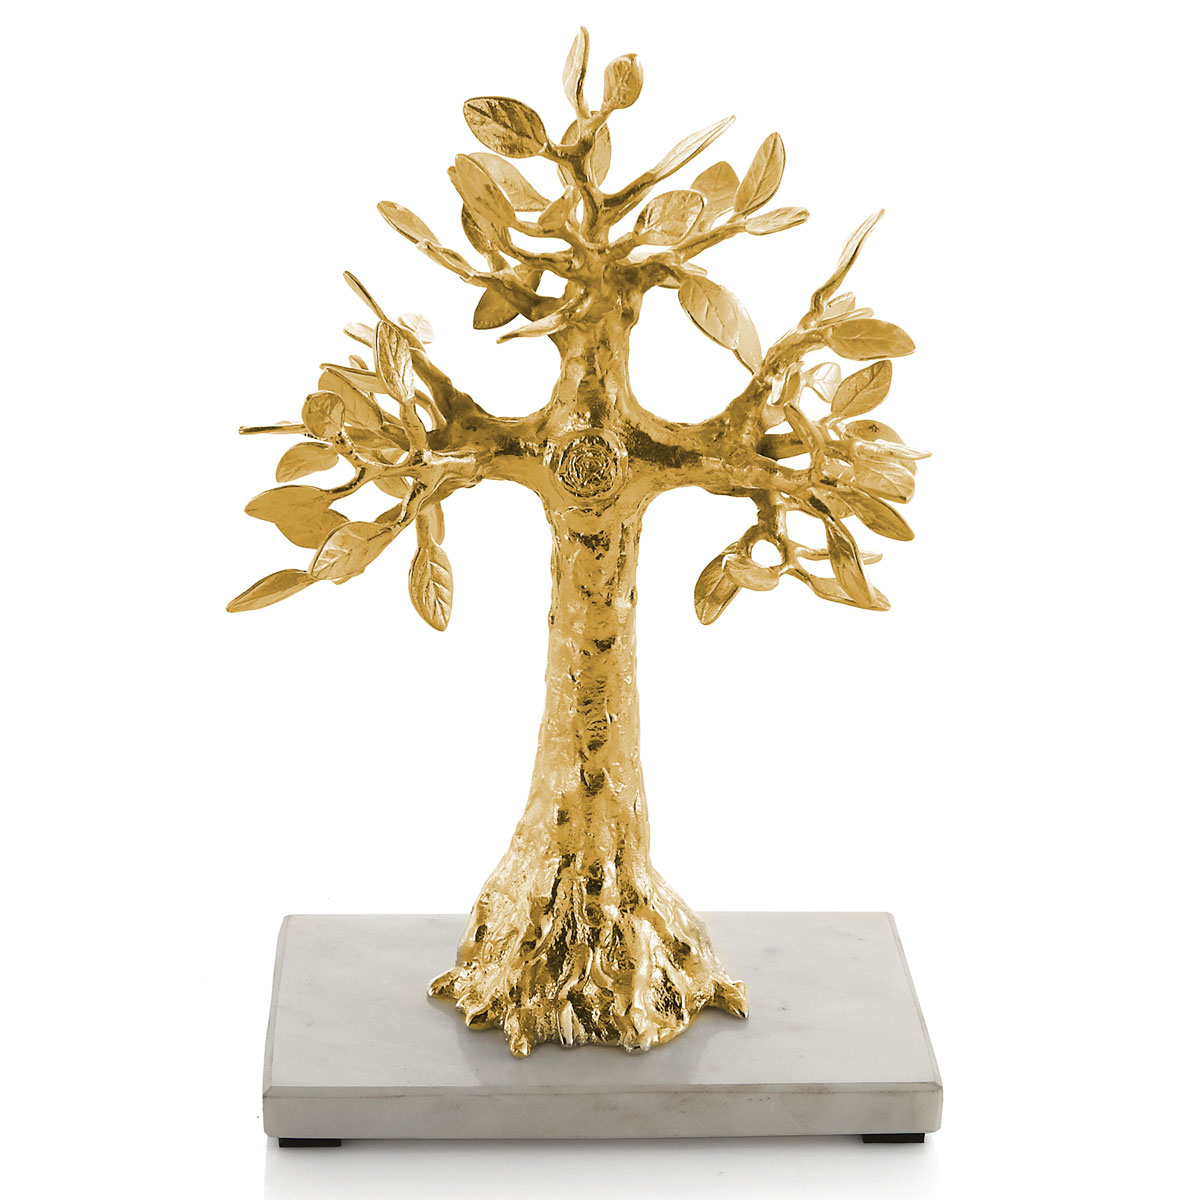 Michael Aram Foliated Cross Sculpture Brass